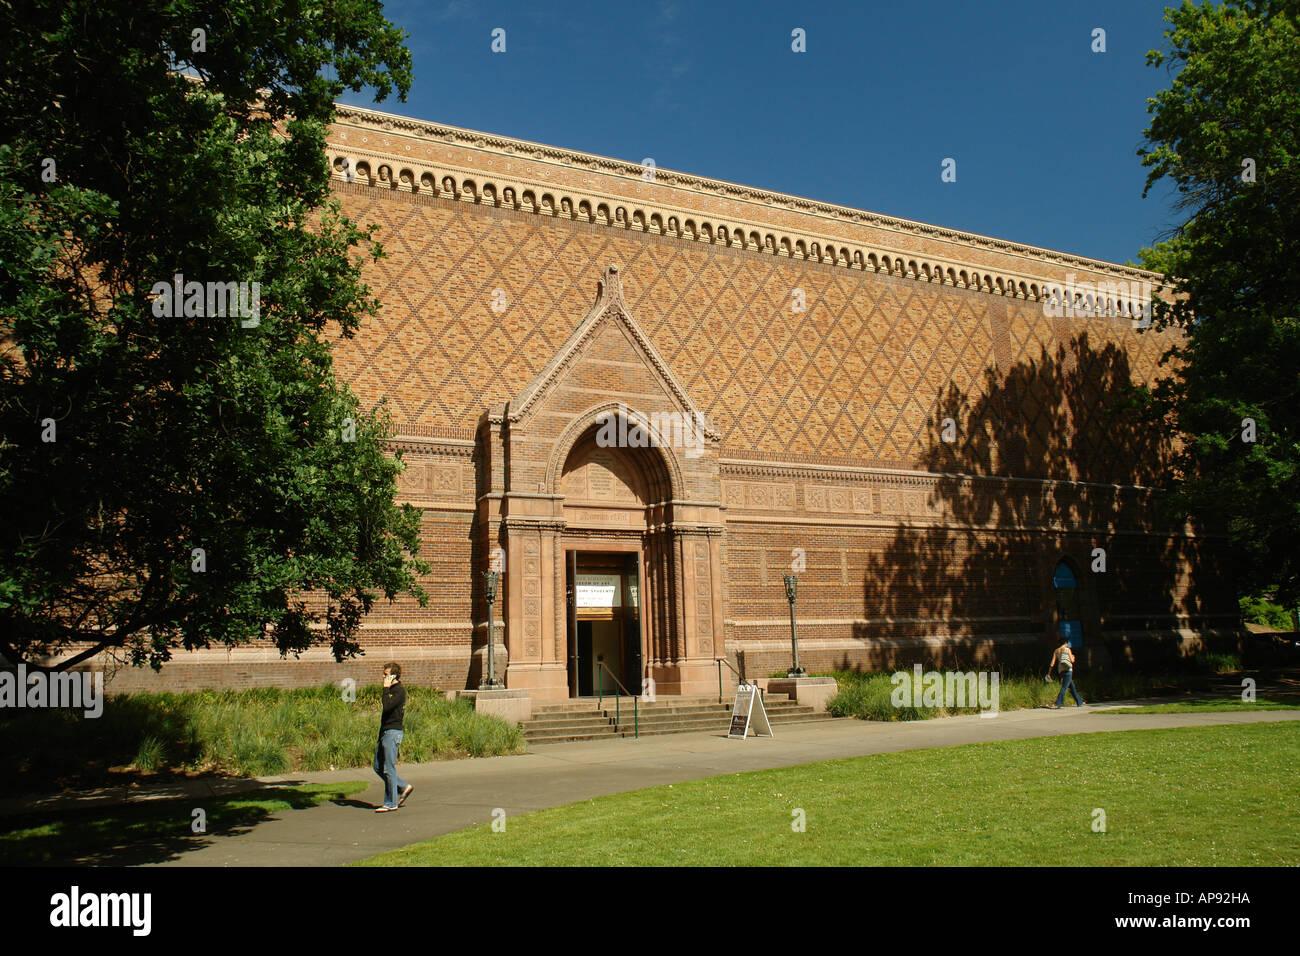 AJD Eugene OR Oregon University Of Oregon Jordan Schnitzer - Jordan schnitzer museum